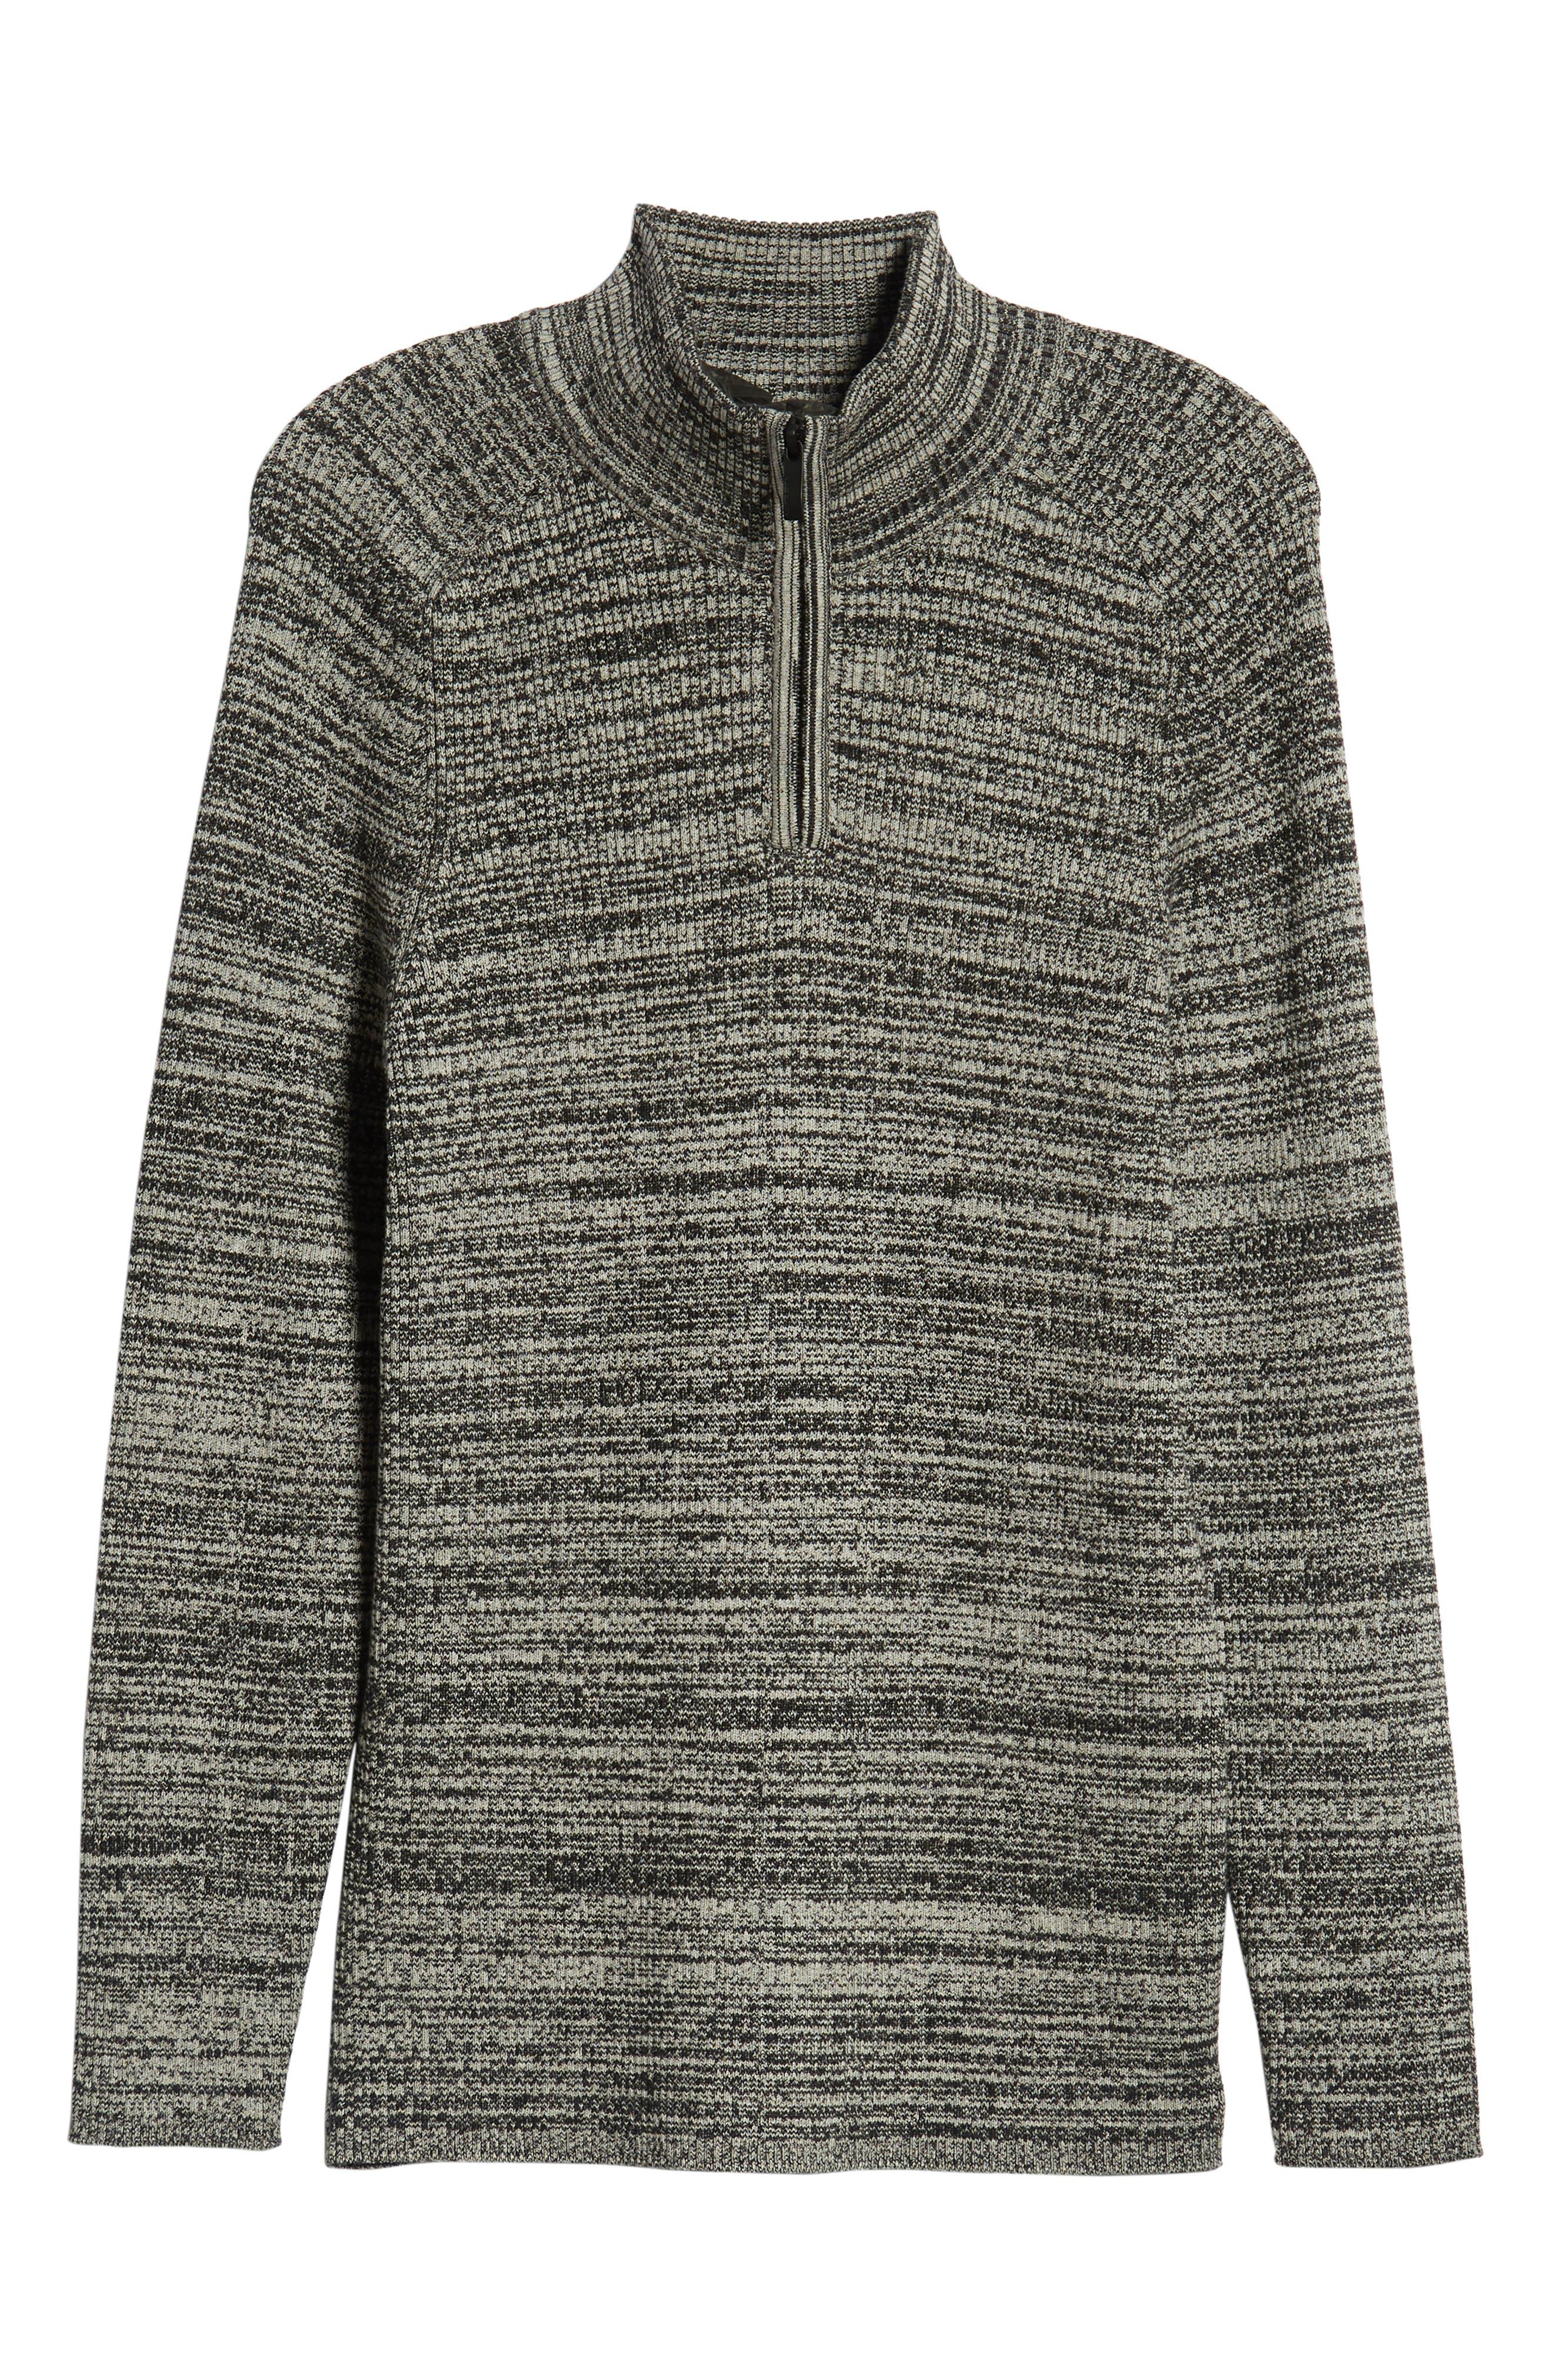 Vince Caumto Quarter Zip Mock Neck Sweater,                             Alternate thumbnail 6, color,                             GREY